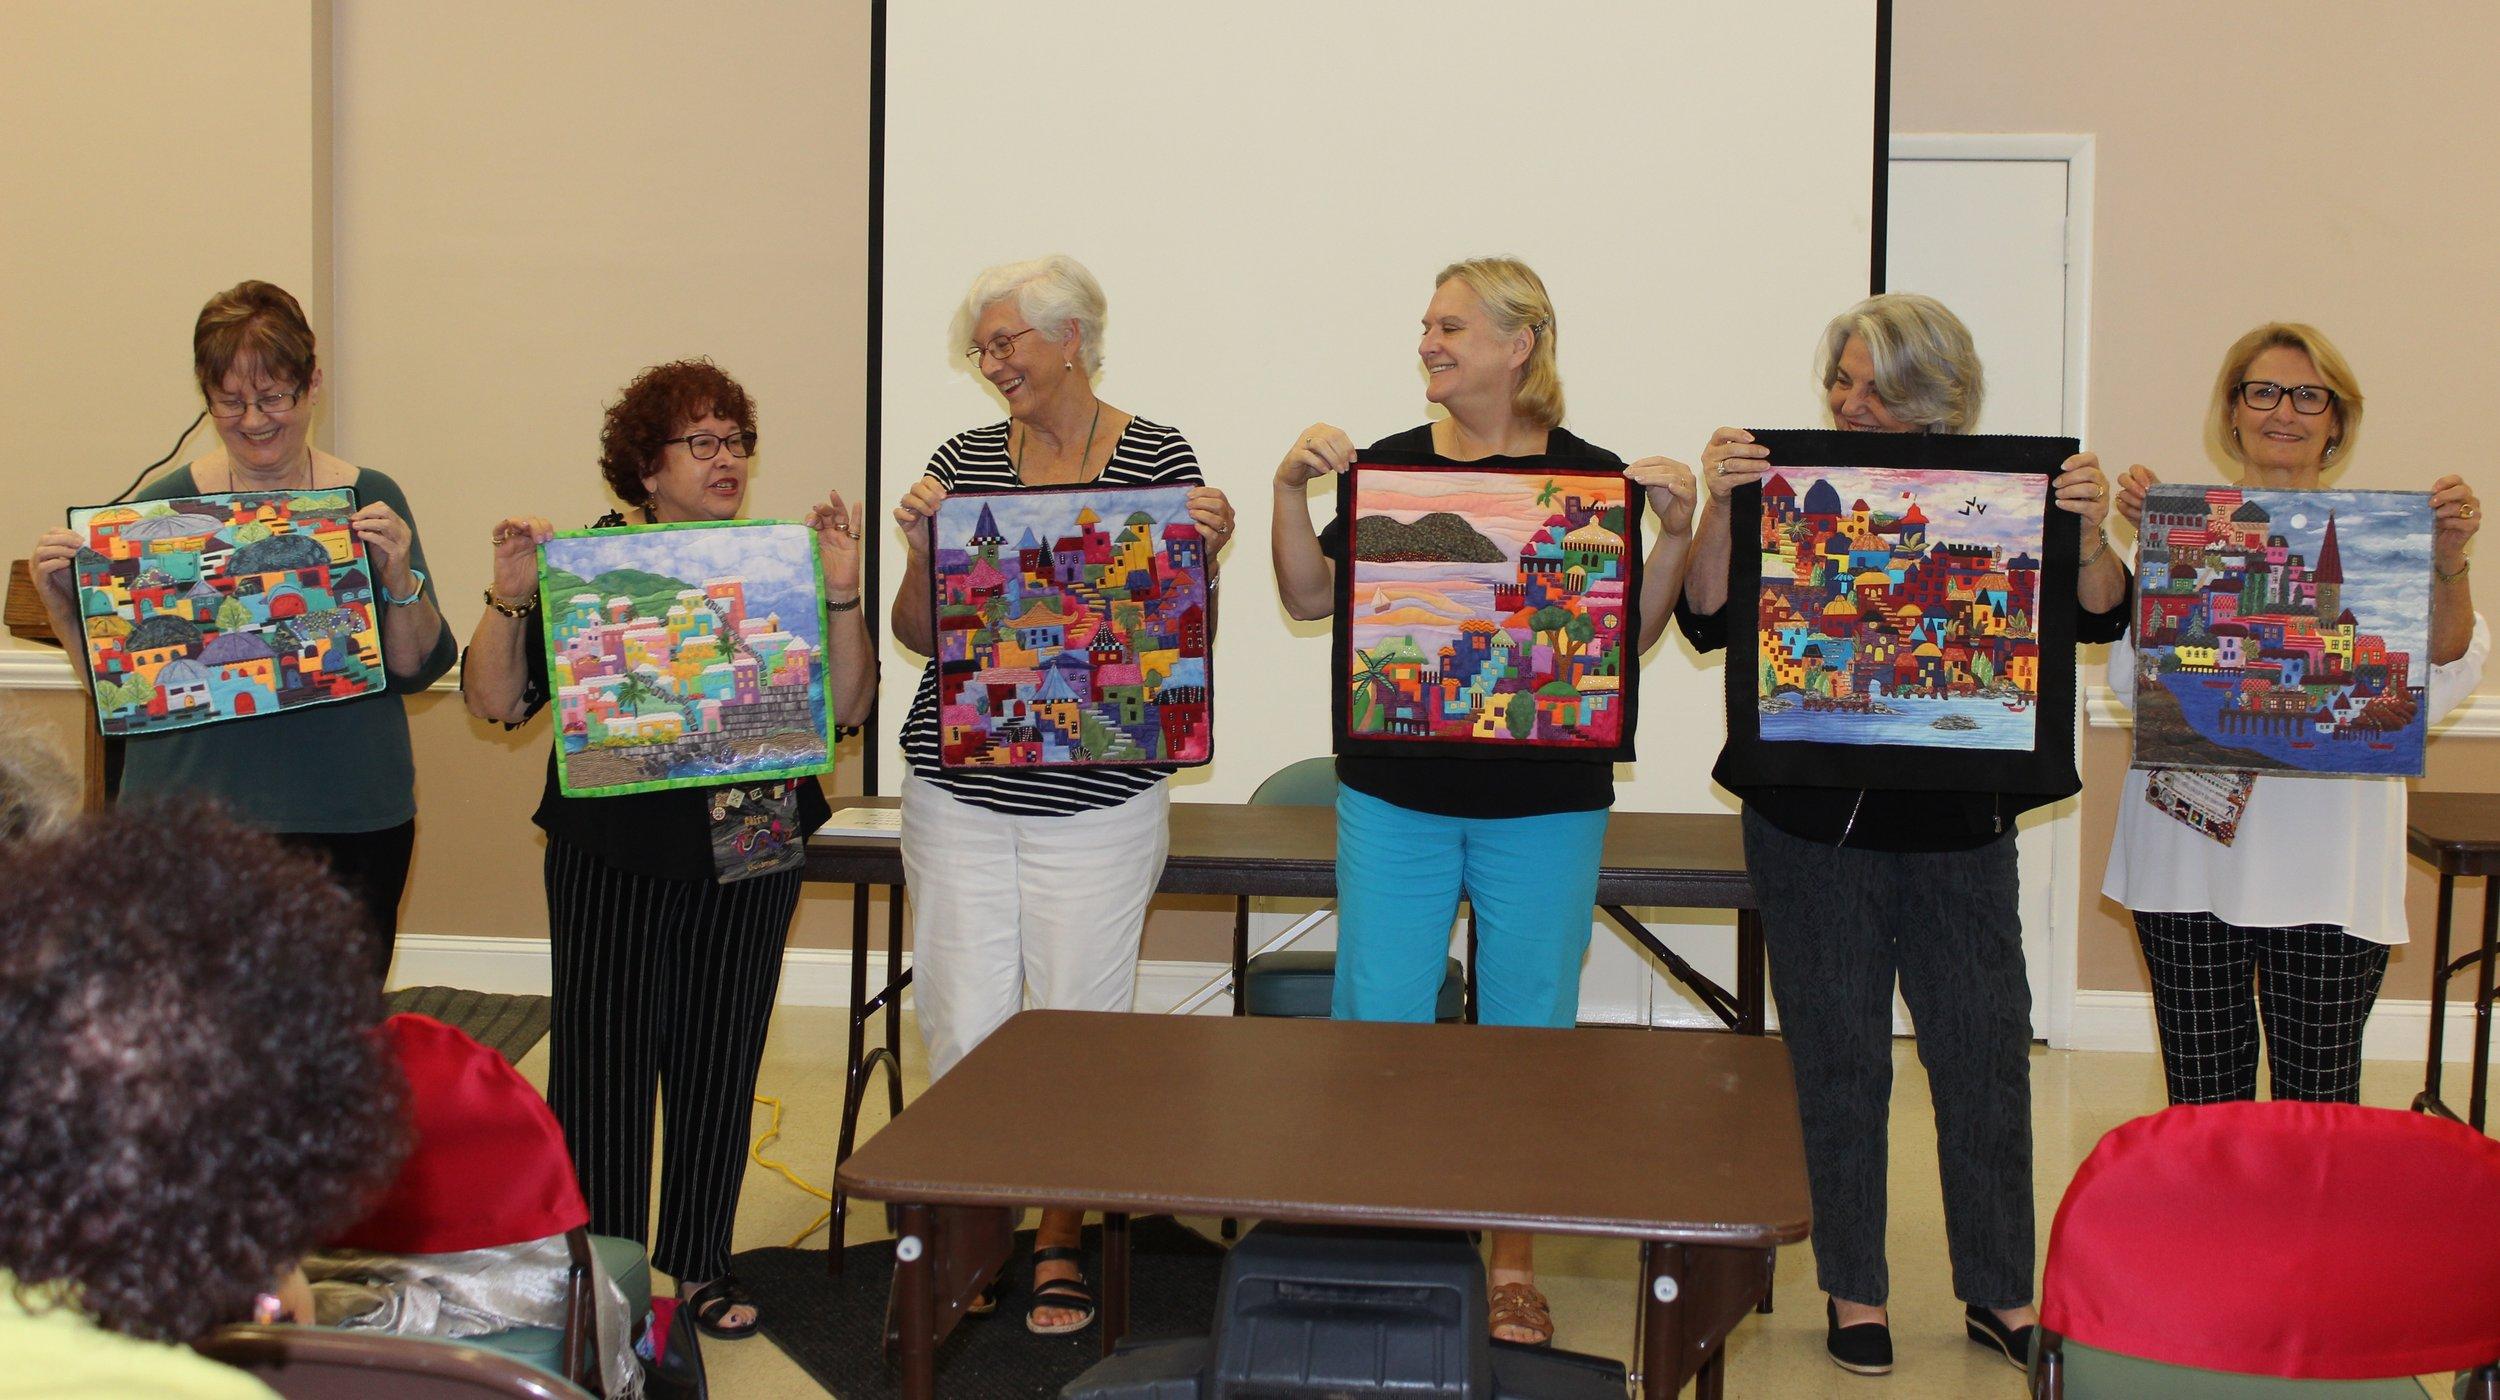 Karen Eckmeier Group of finished Happy Villages.jpg